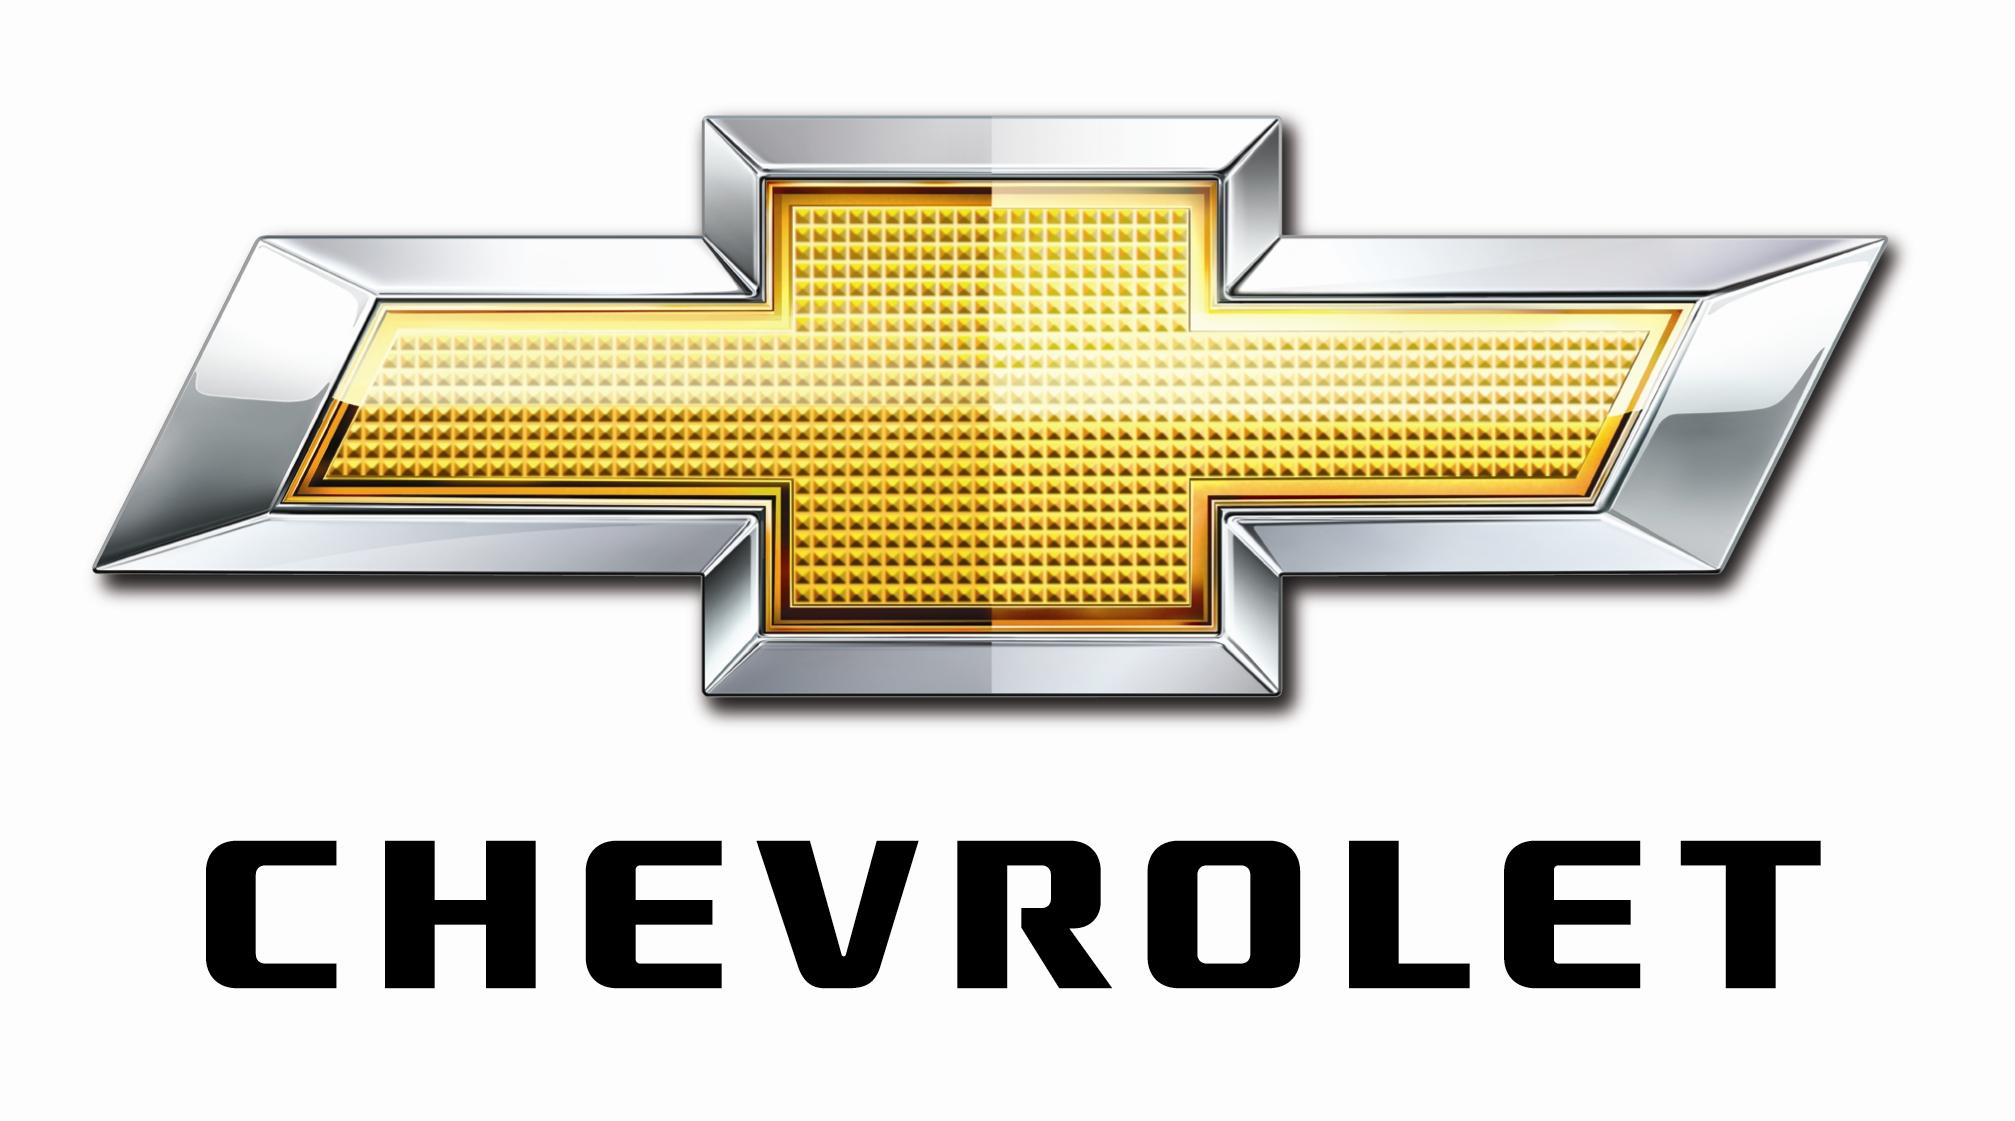 Chevy Truck Logos